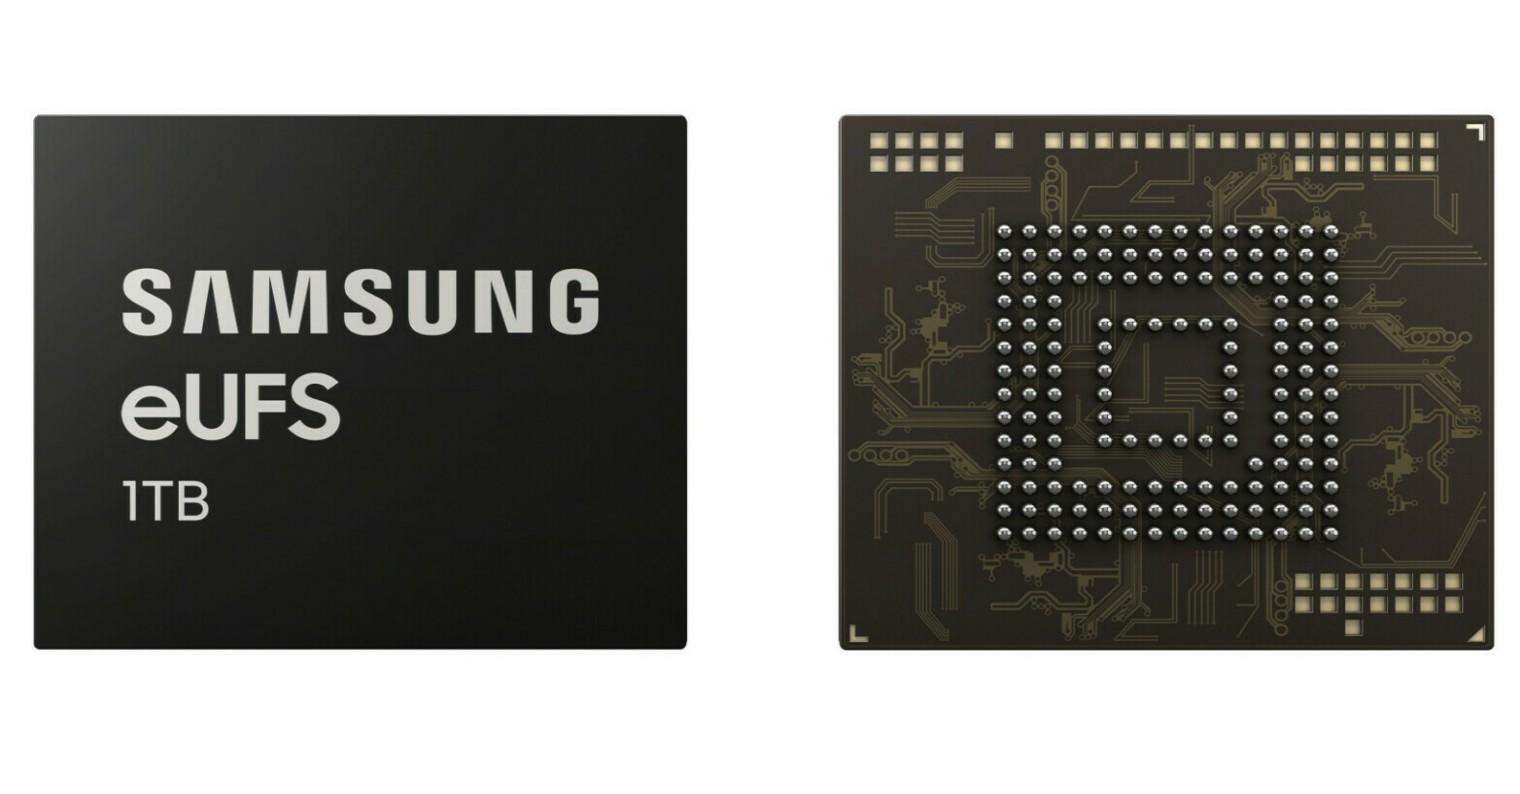 Samsung 1TB eUFS-1520×794